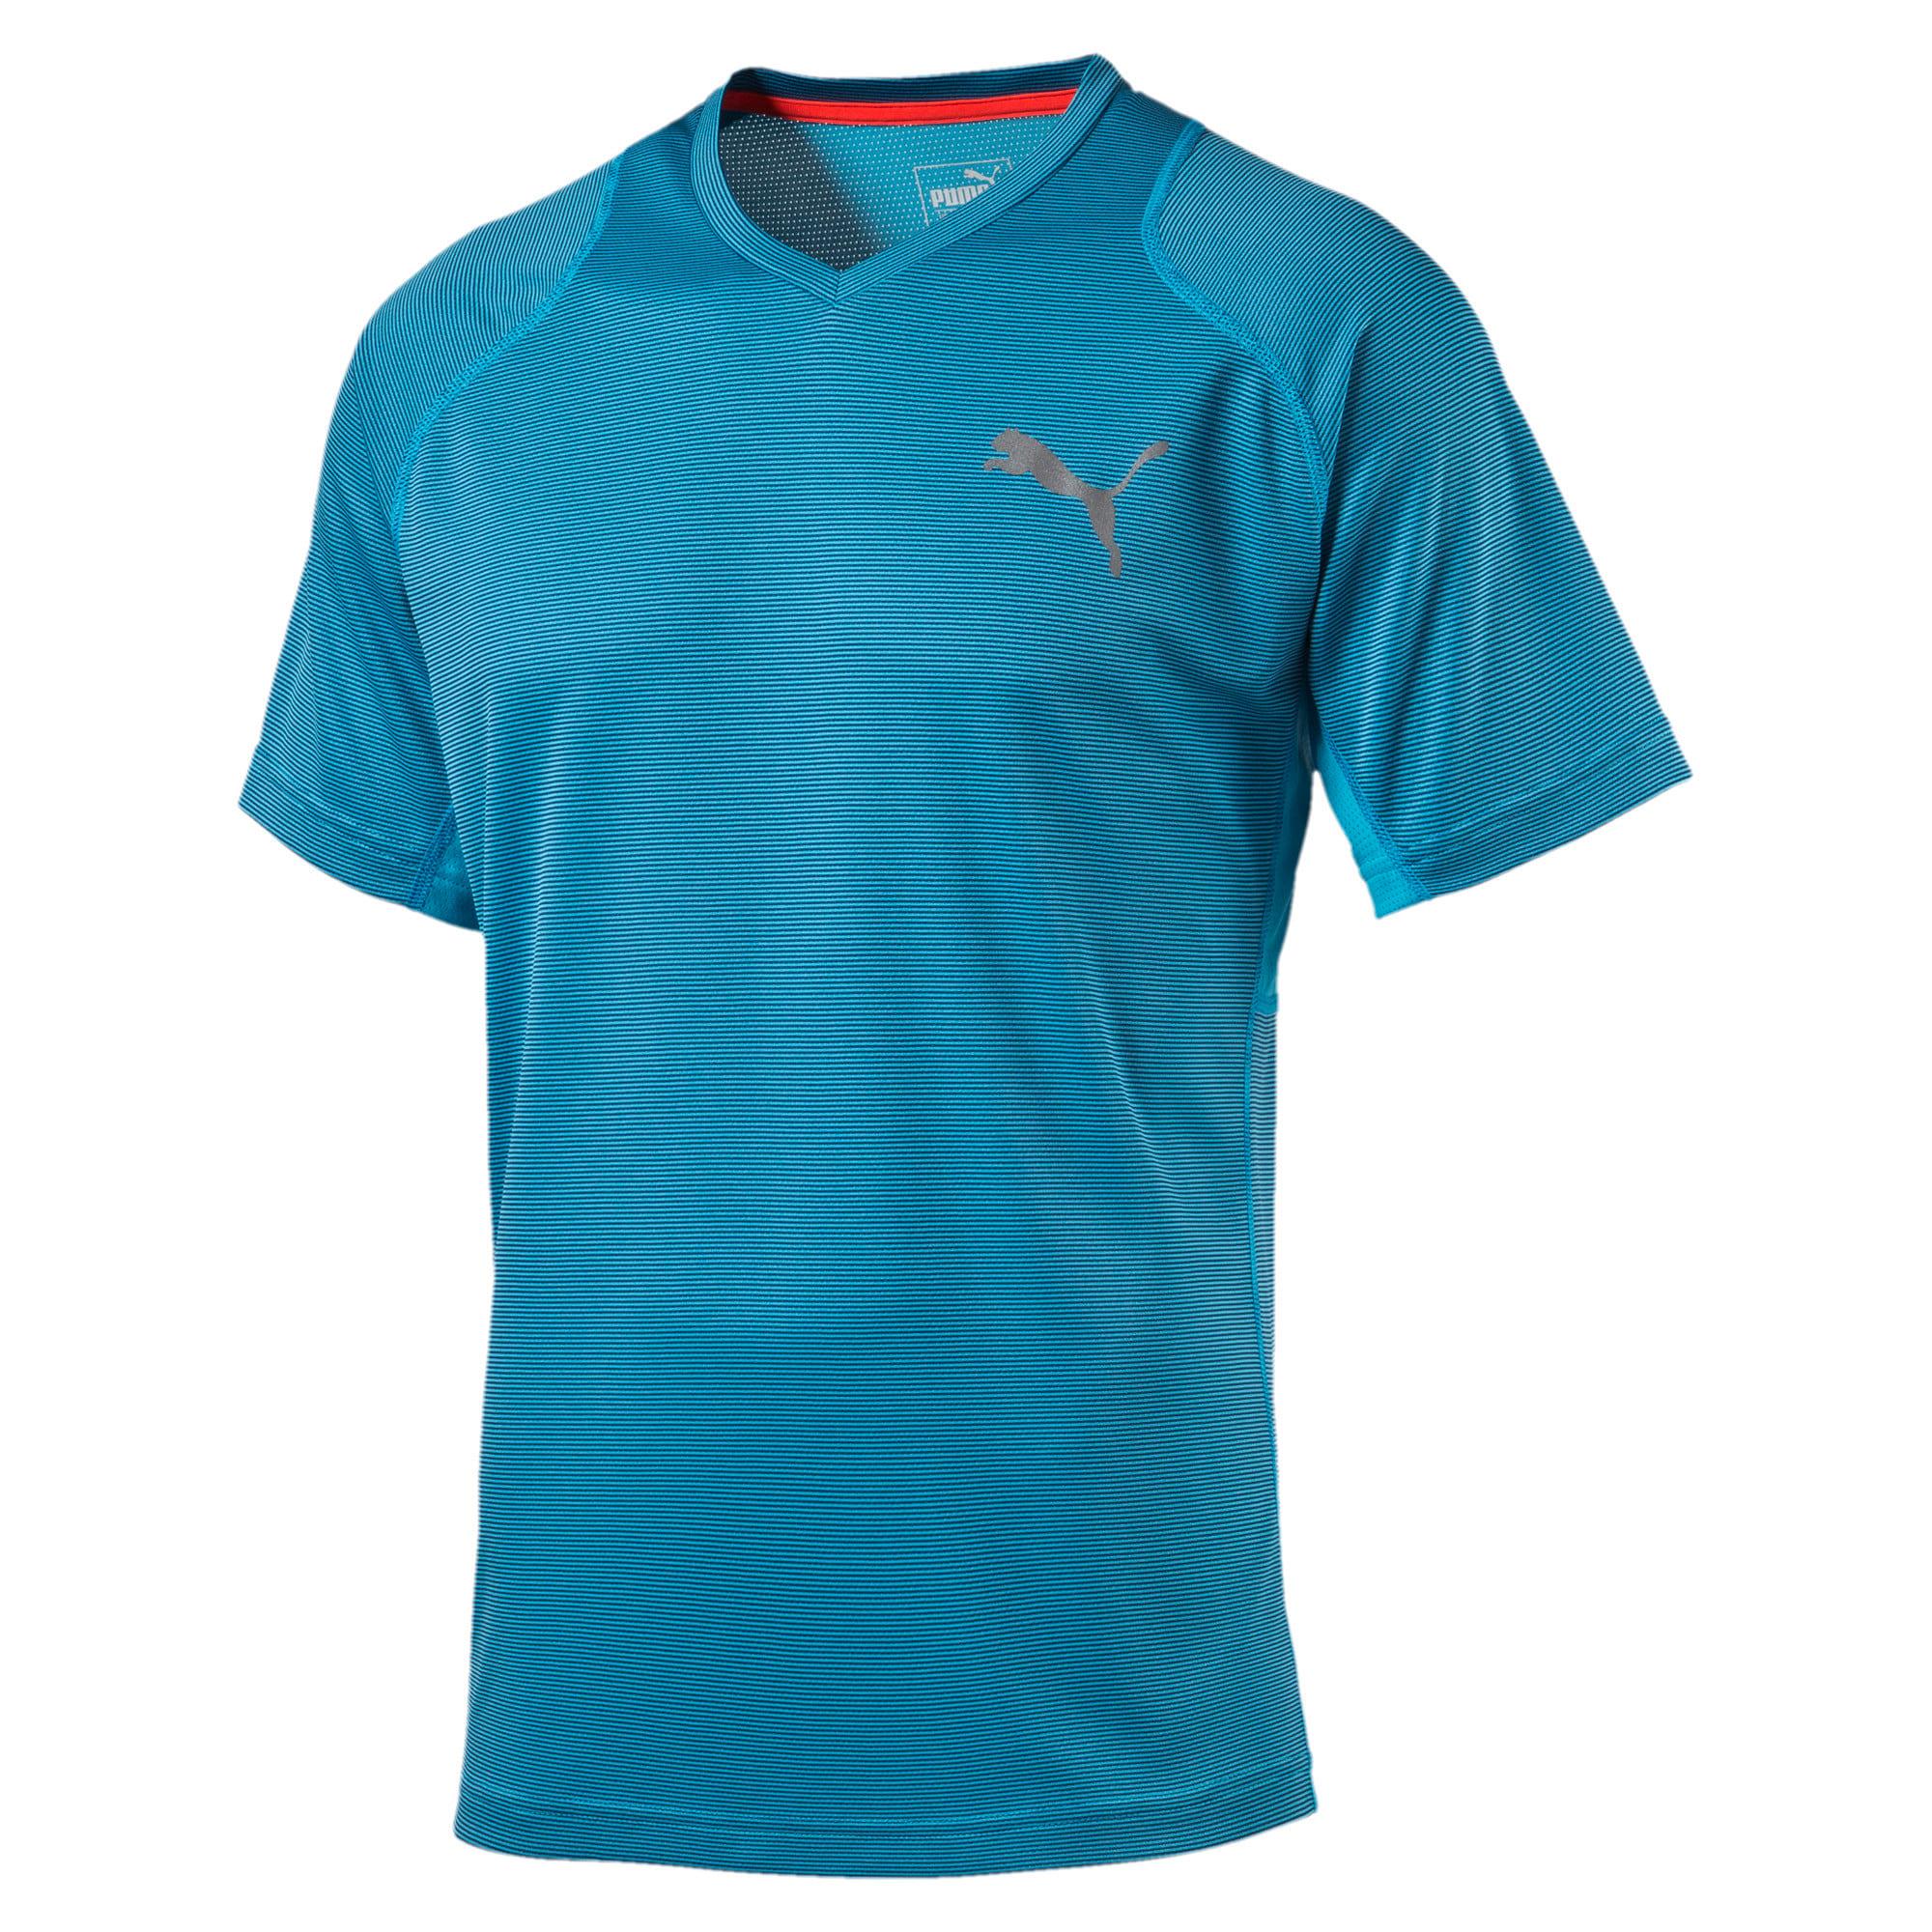 Thumbnail 4 of Active Training Vent Stripe T-Shirt, atomic blue-w/ Black, medium-IND